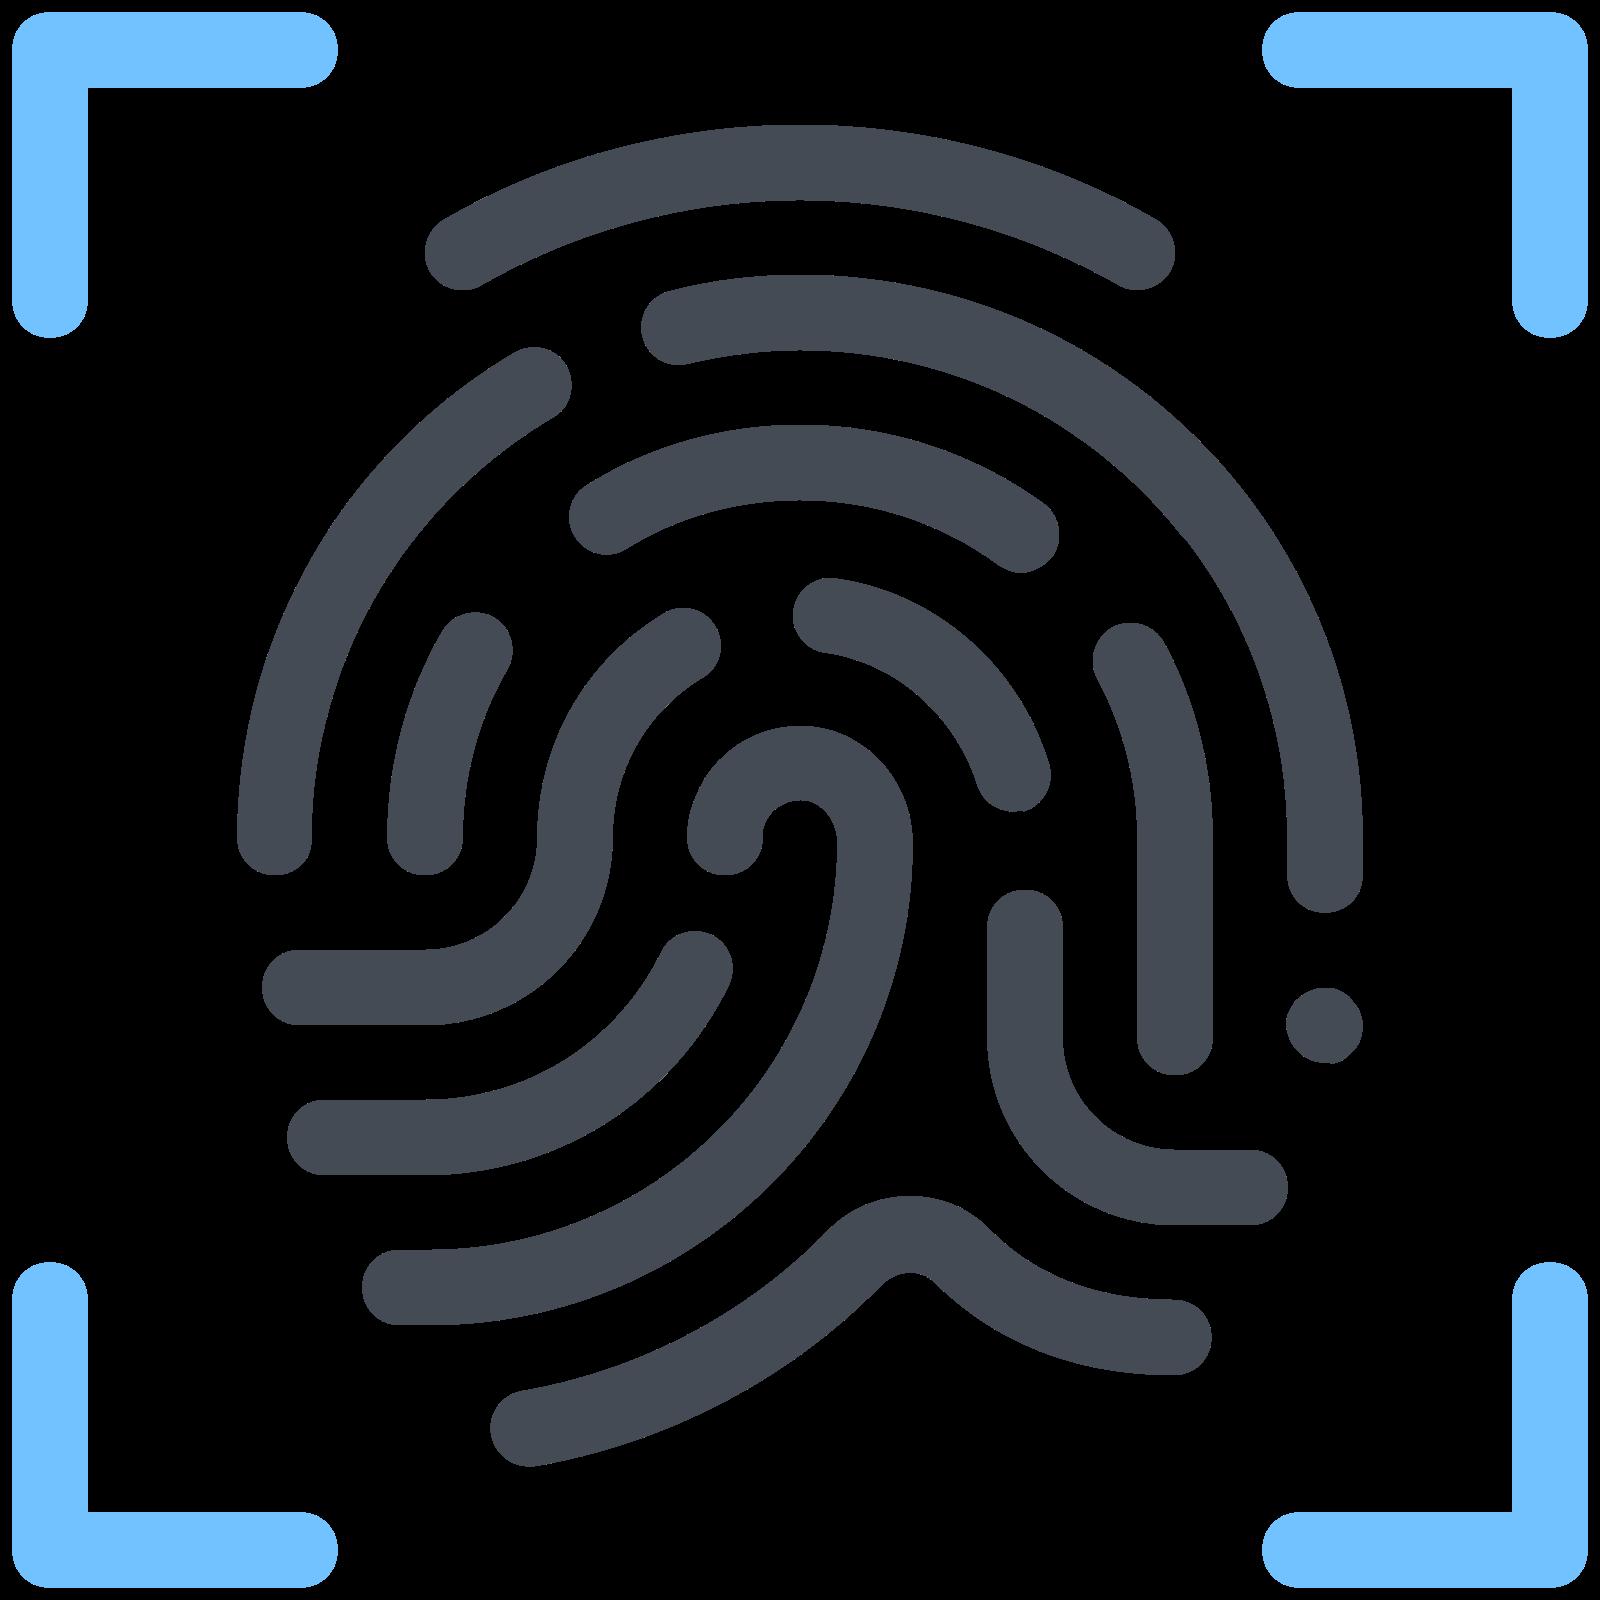 Распознавание отпечатков пальцев icon